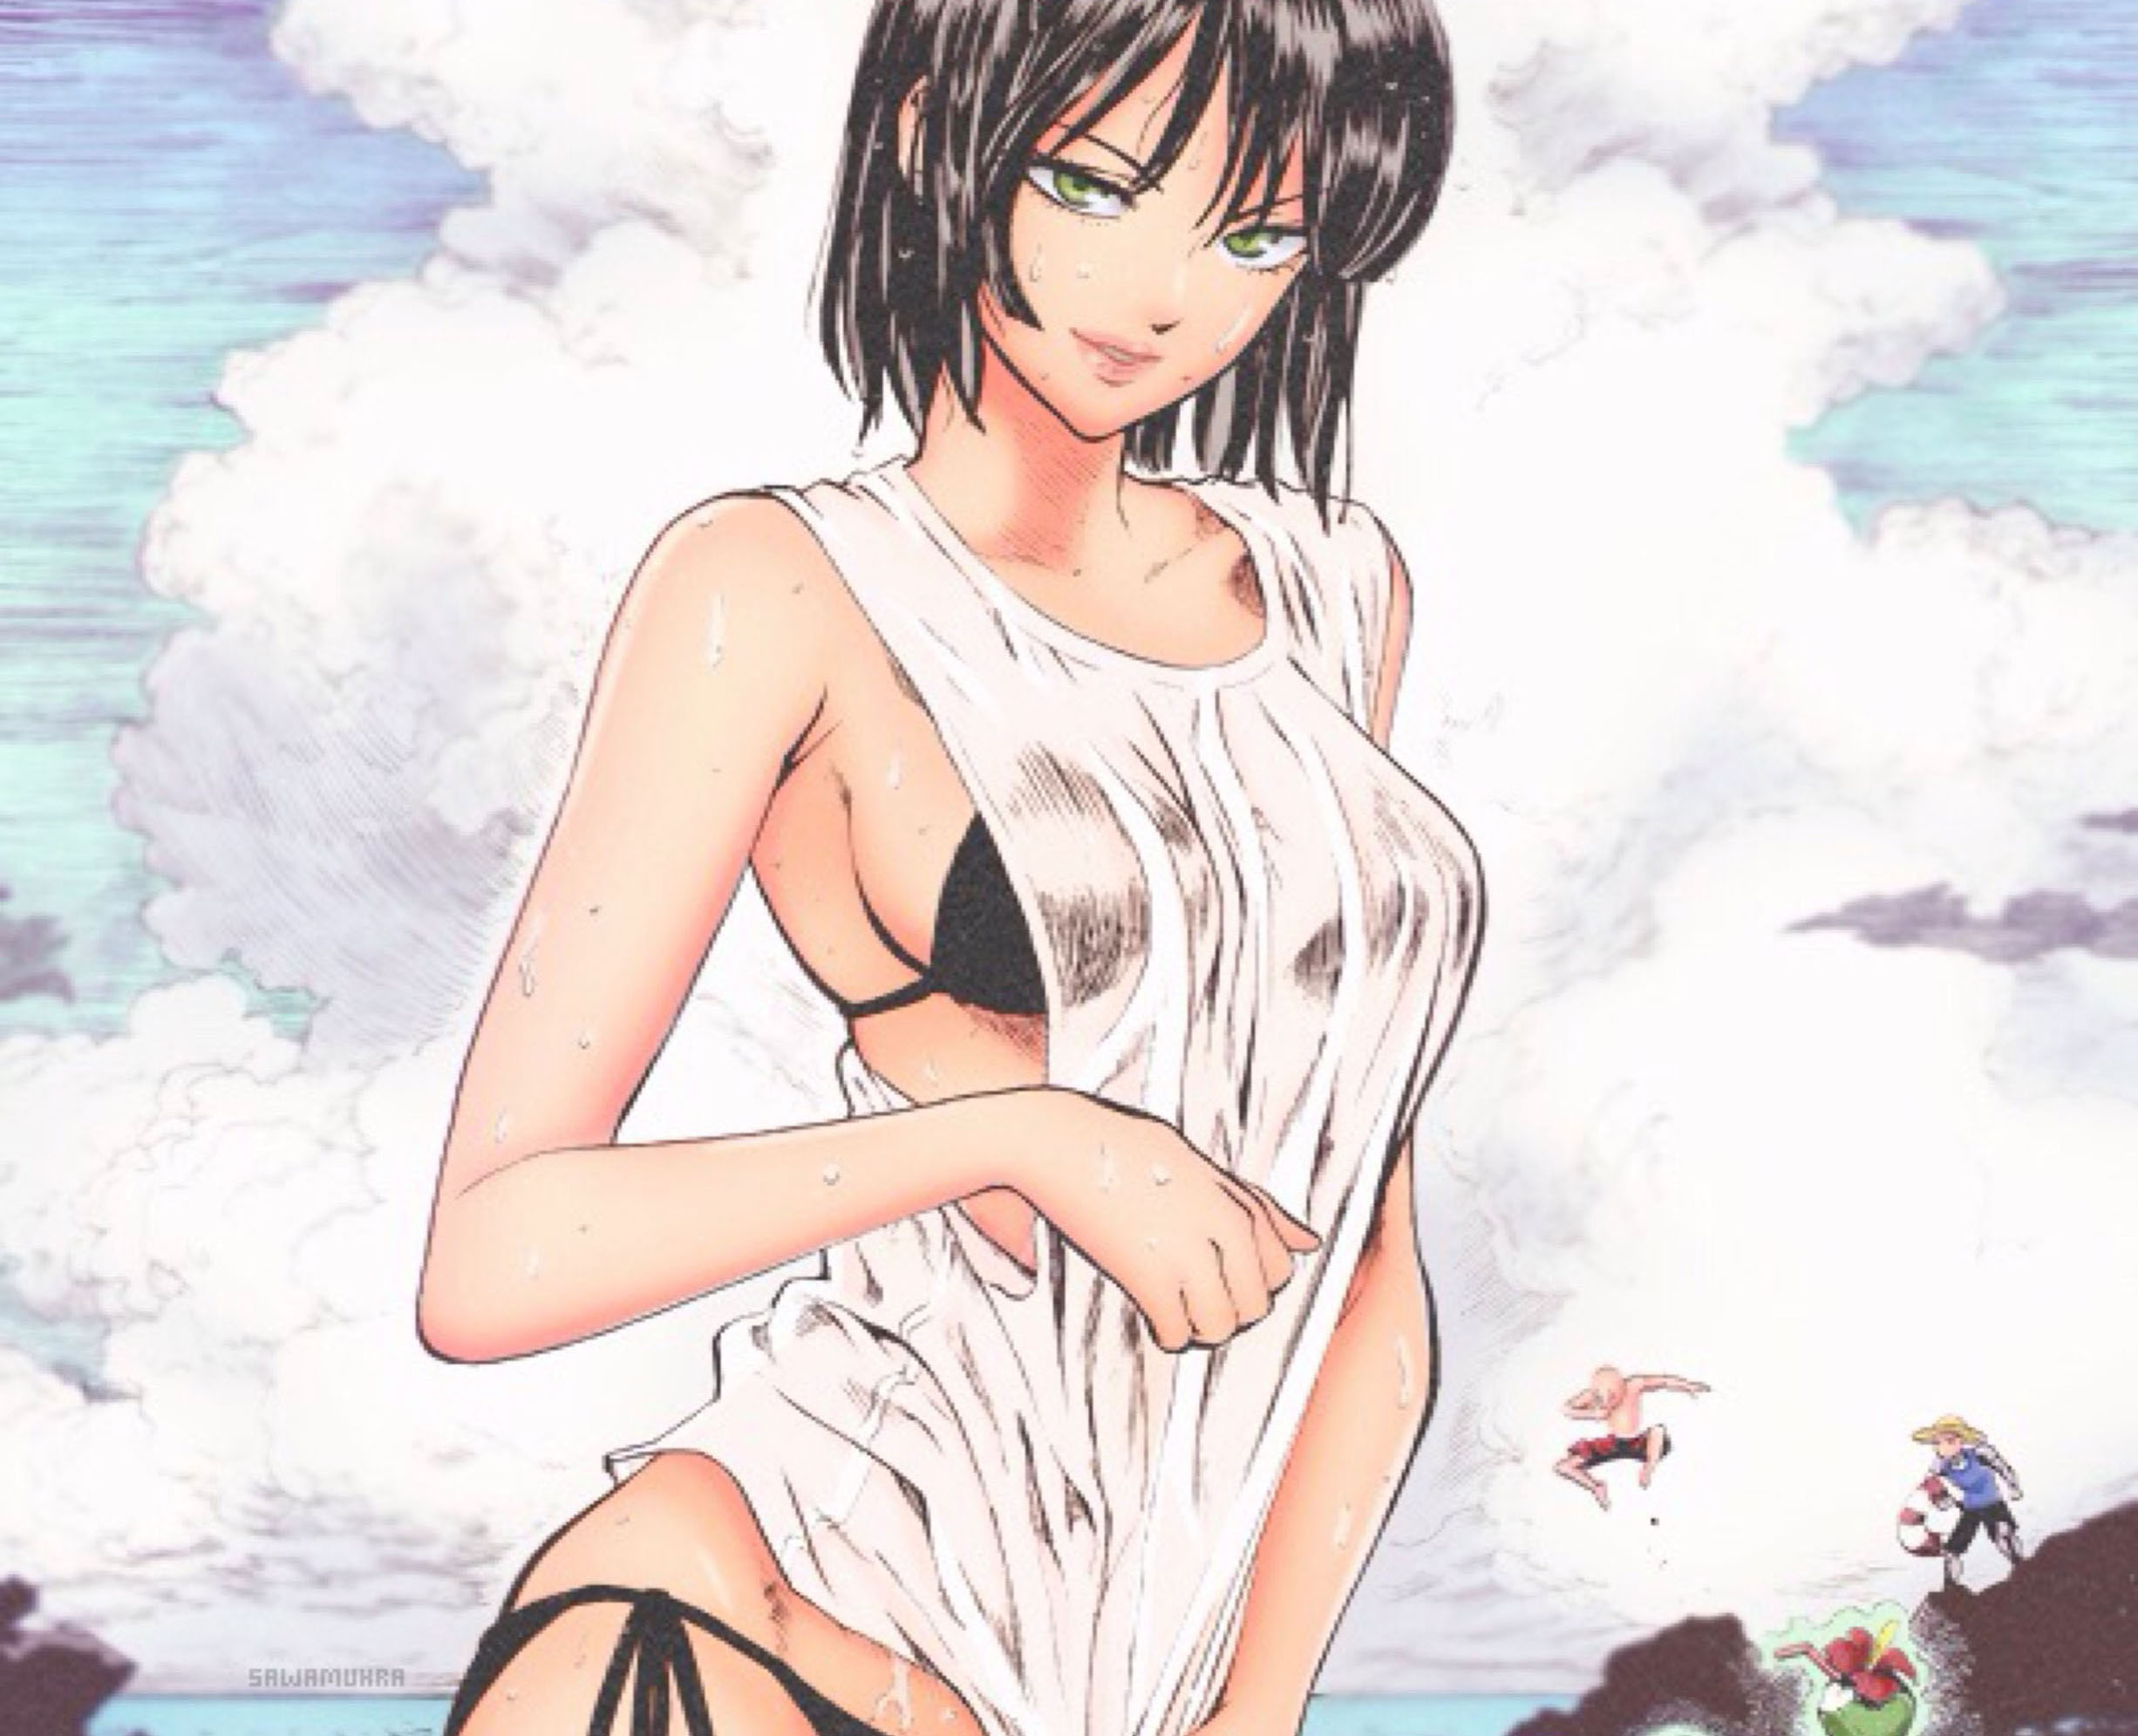 Anime 2452x1991 One-Punch Man Fubuki bikini anime anime girls